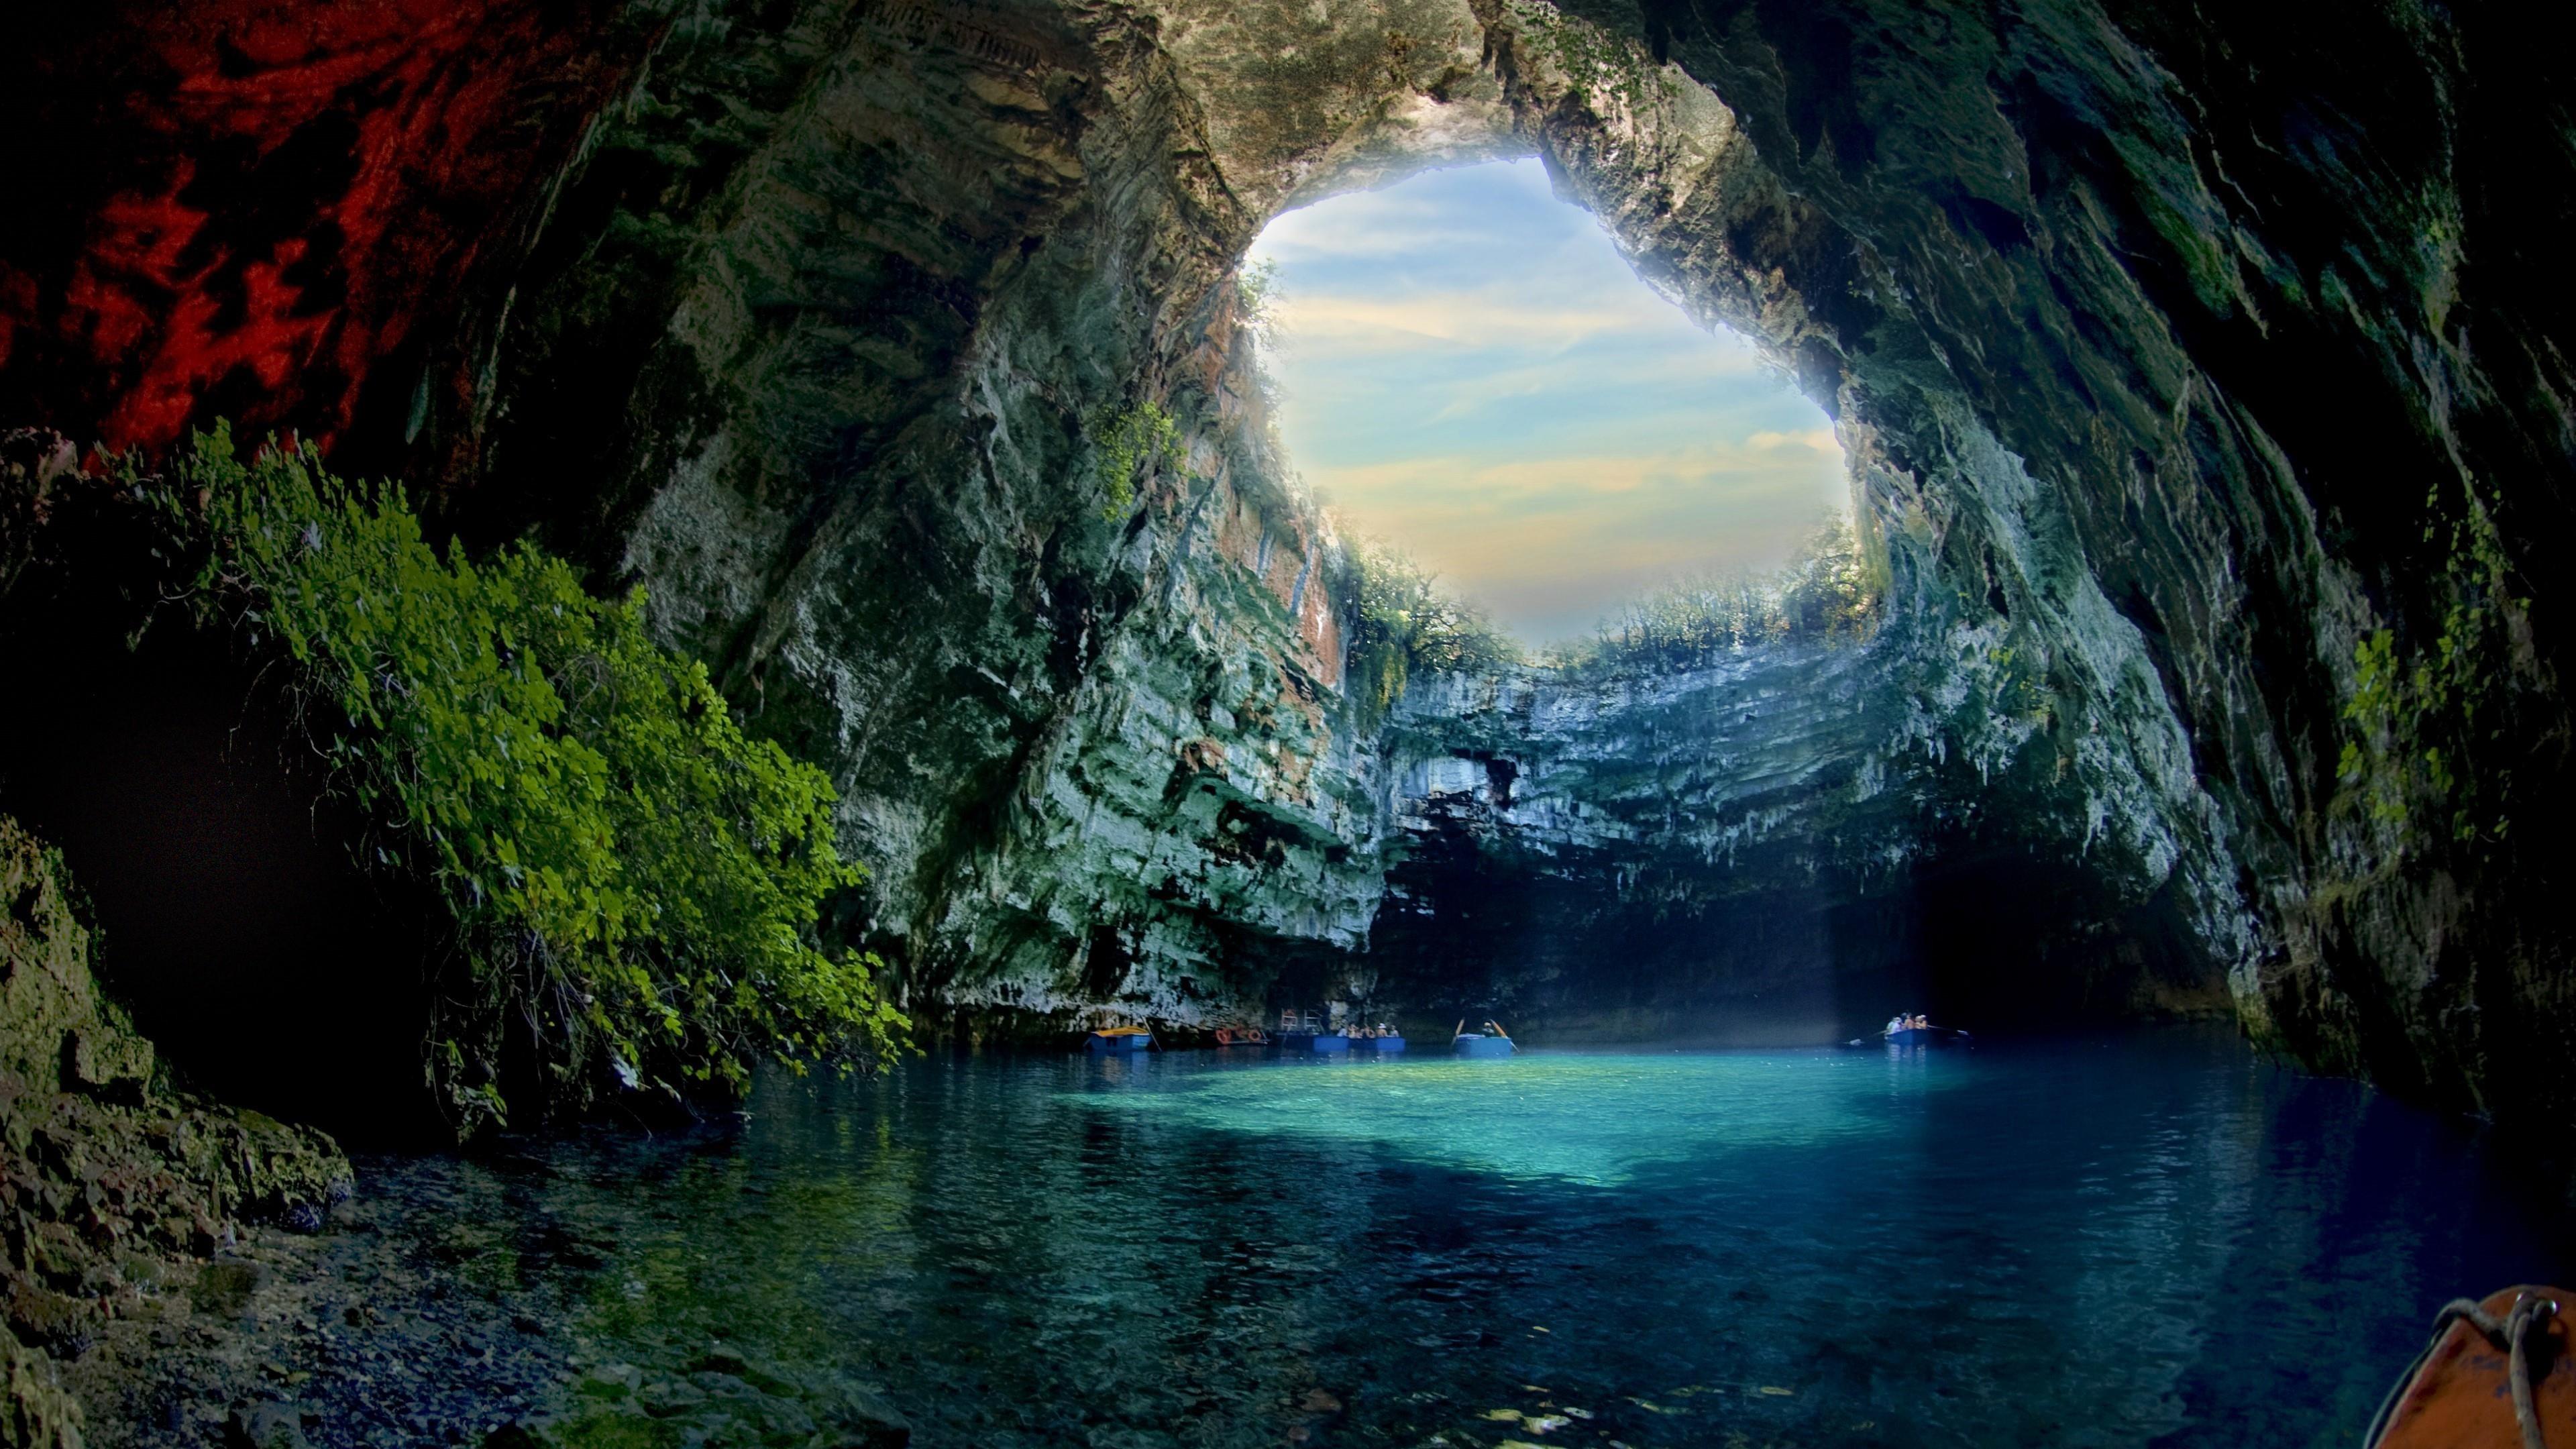 Wallpapers Cave - Wallpaper Cave